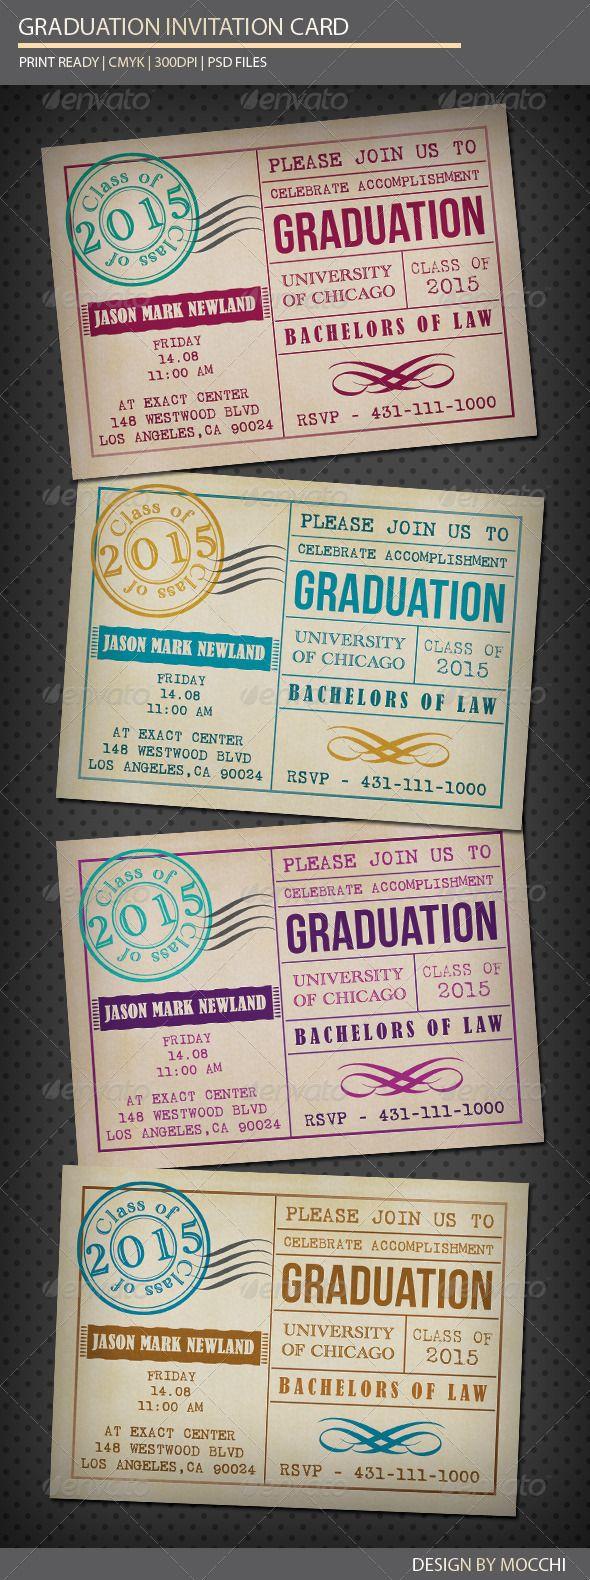 Graduation Invitation Card